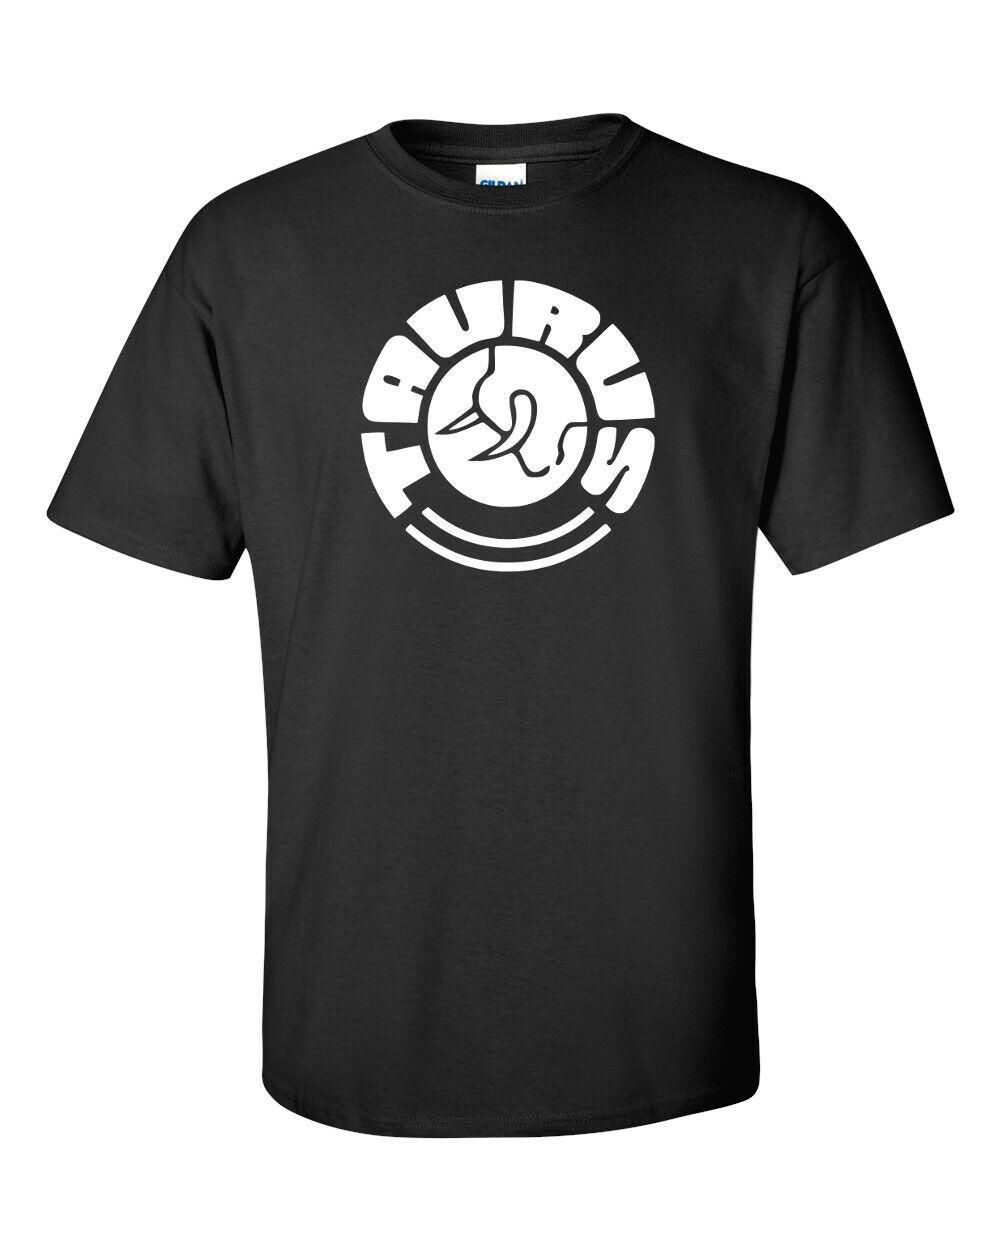 Taurus Firearms White Logo T Shirt 2nd Amendment Pro Gun Rights Rifle Pistol Tee